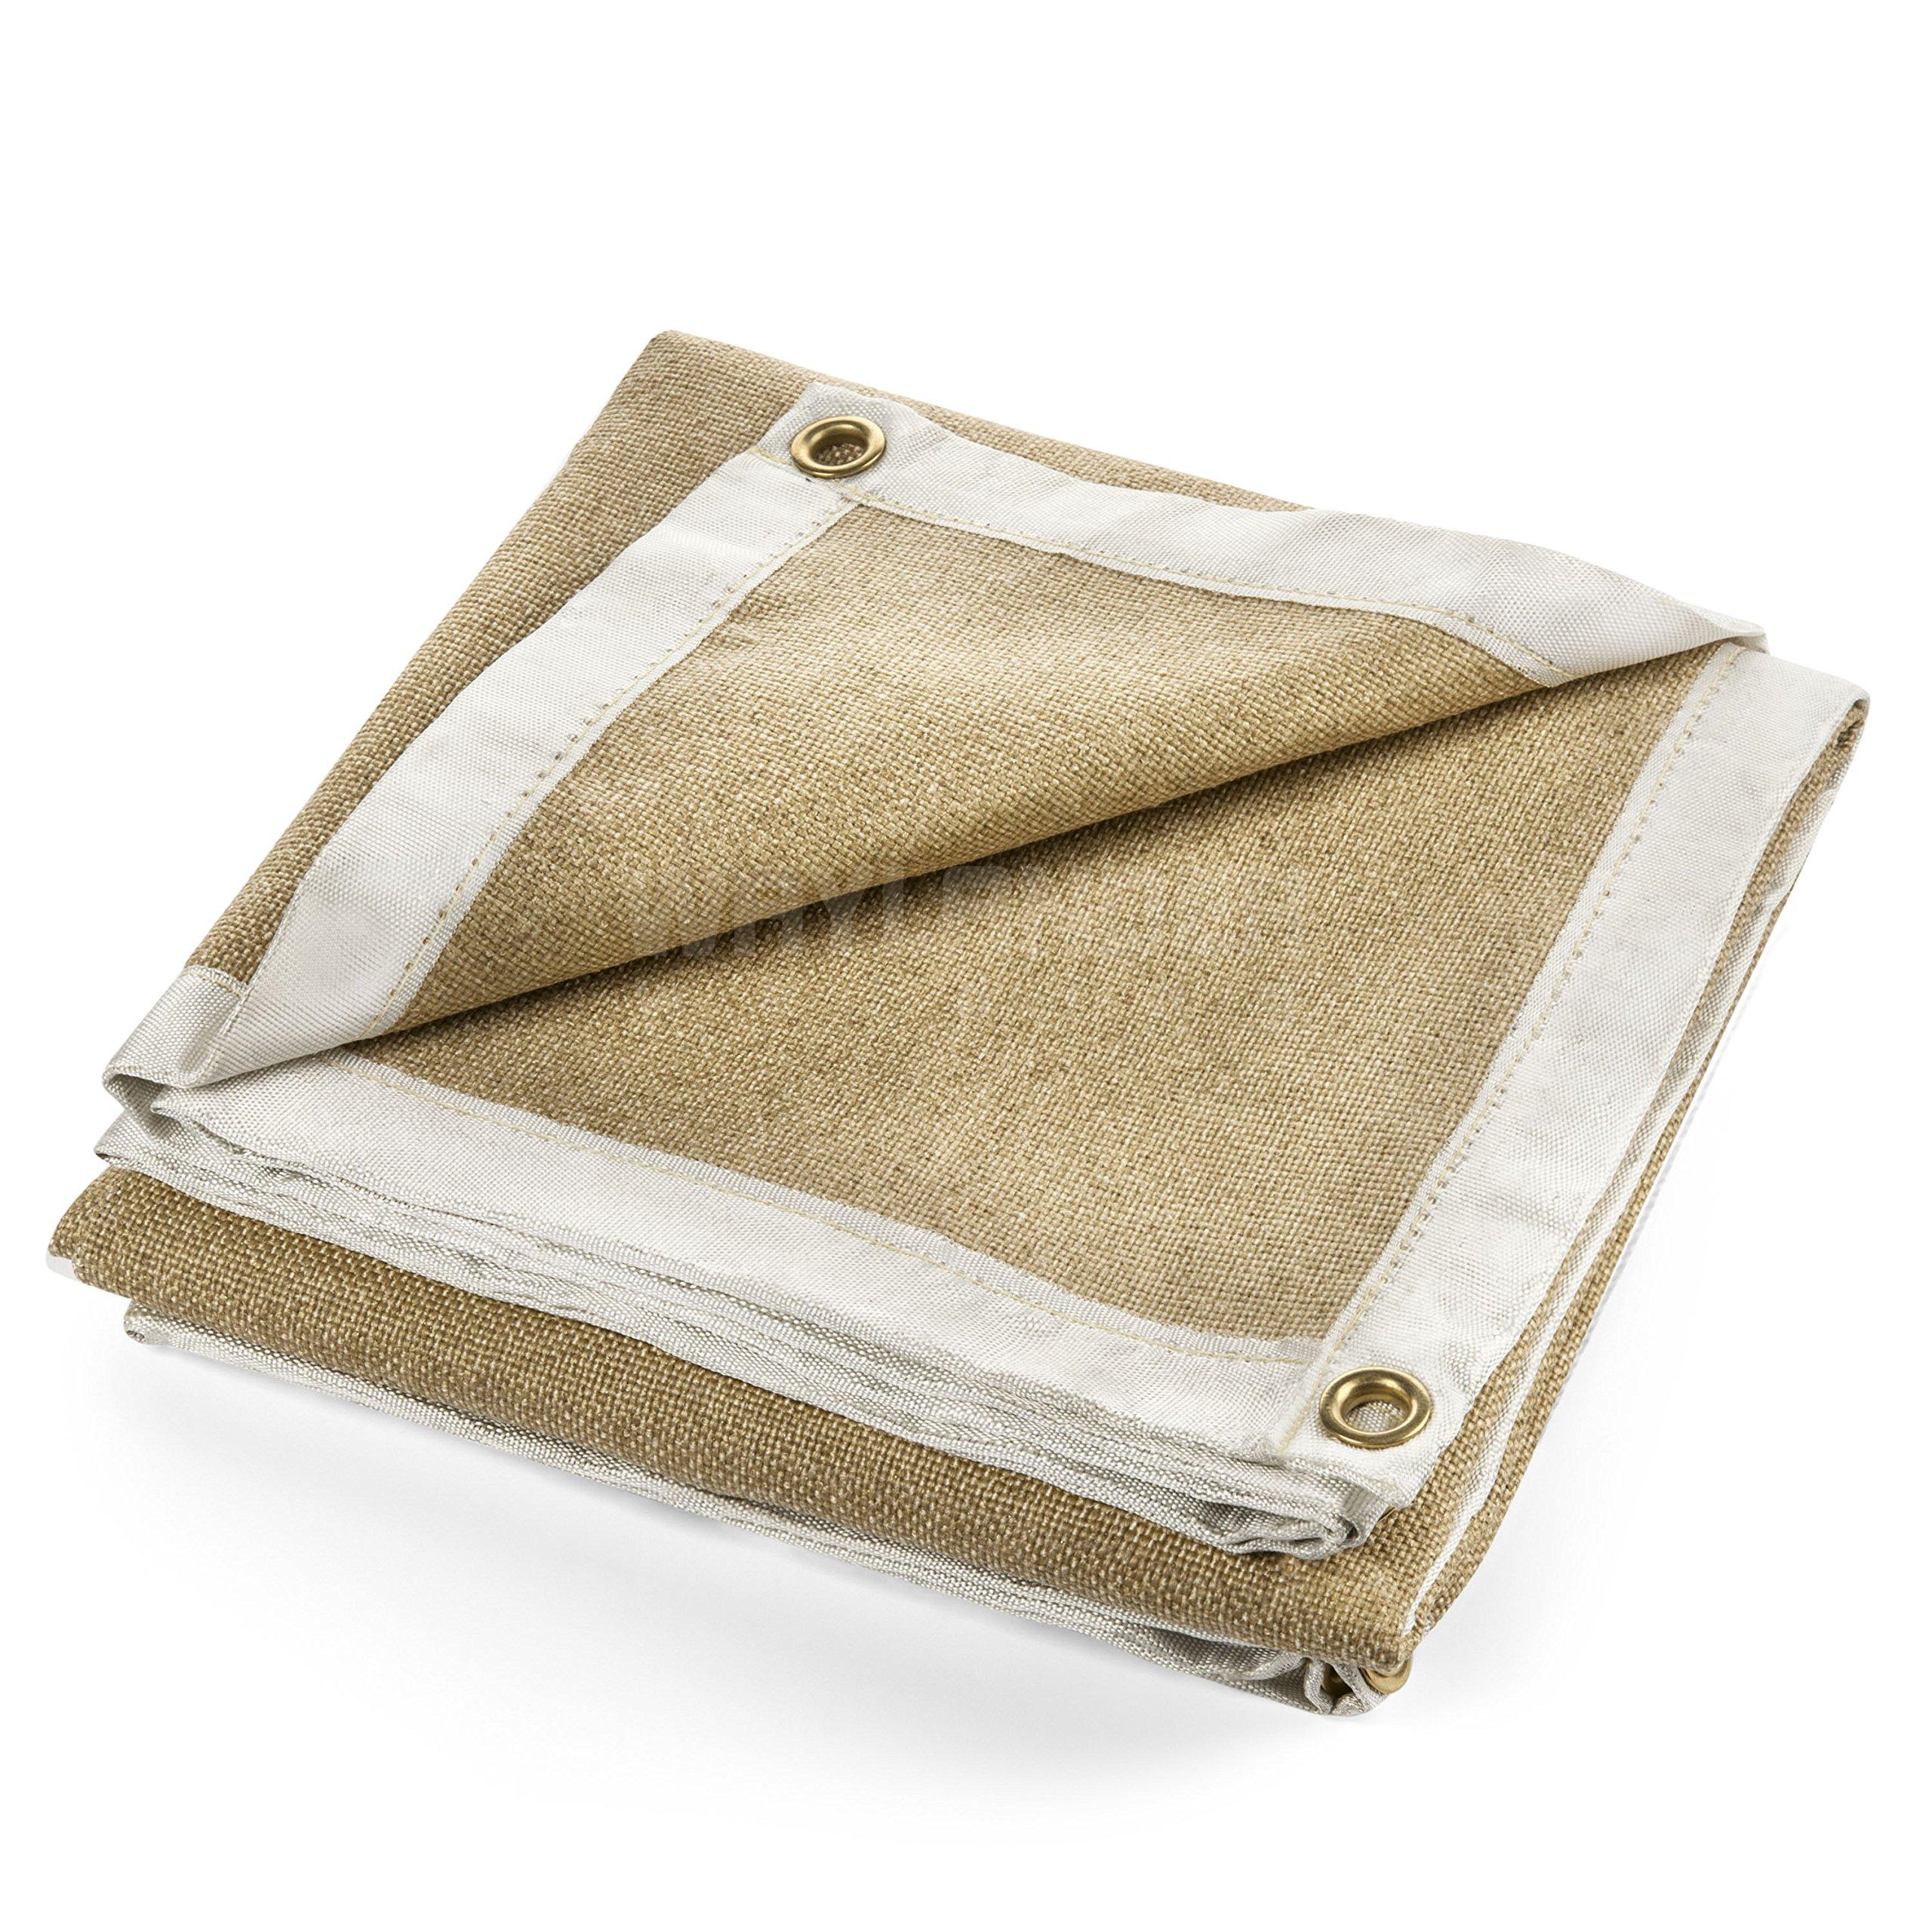 Waylander Welding Blanket Premium 4' x 6' 1400°F Heavy Duty Welders Kevlar Stitched Vermiculite Impregnated Fiberglass with Brass Grommets by Waylander